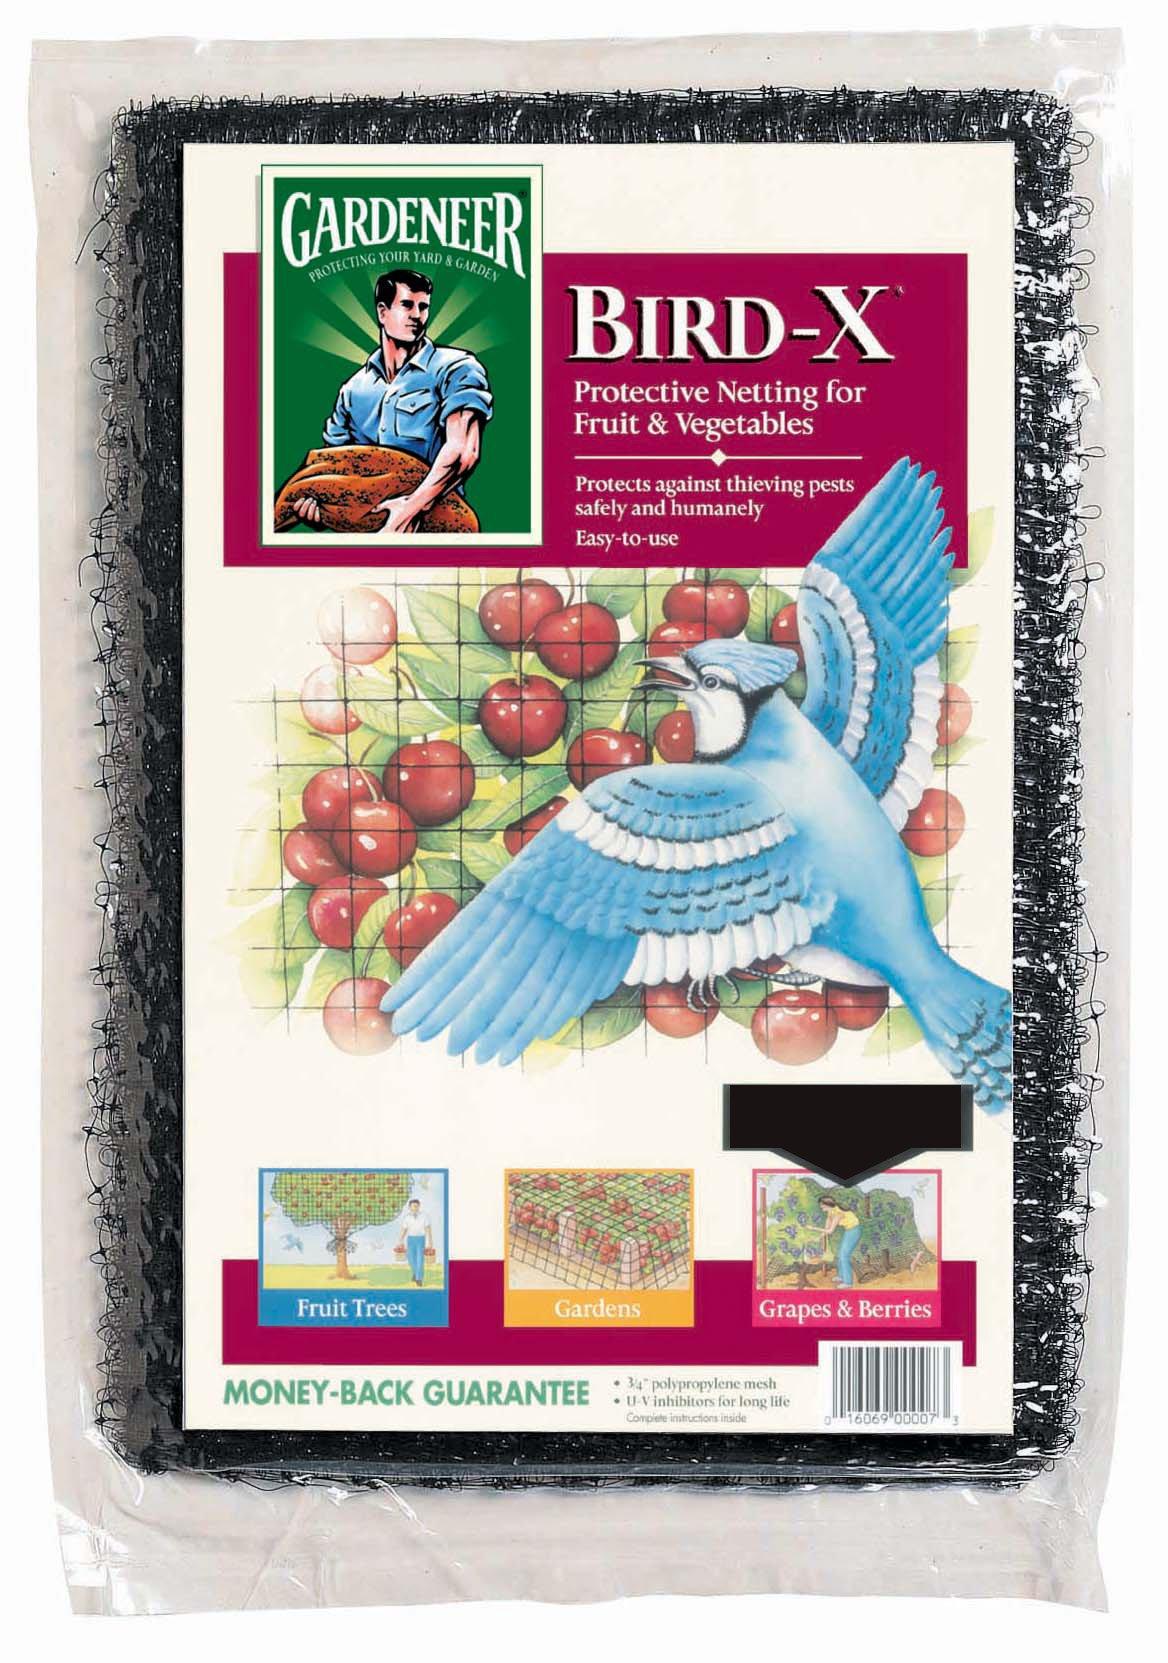 Gardeneer BN-5 14' x 75' Bird-X® Netting